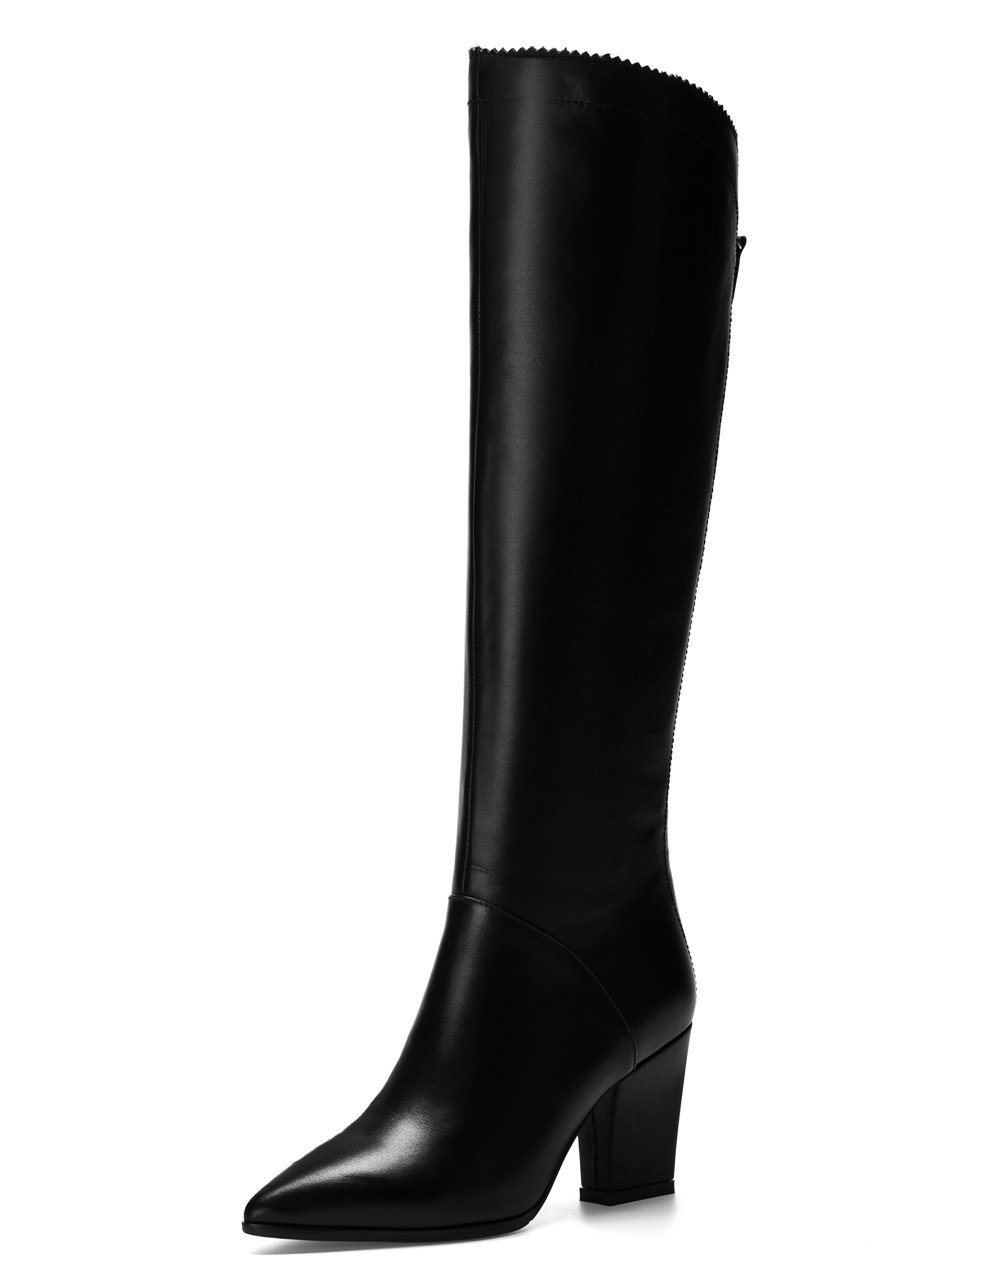 Nine Seven Genuine Leather Women's Pointed Toe Chunky Heel Style Handmade Dressy Knee High Boot (8, Black)